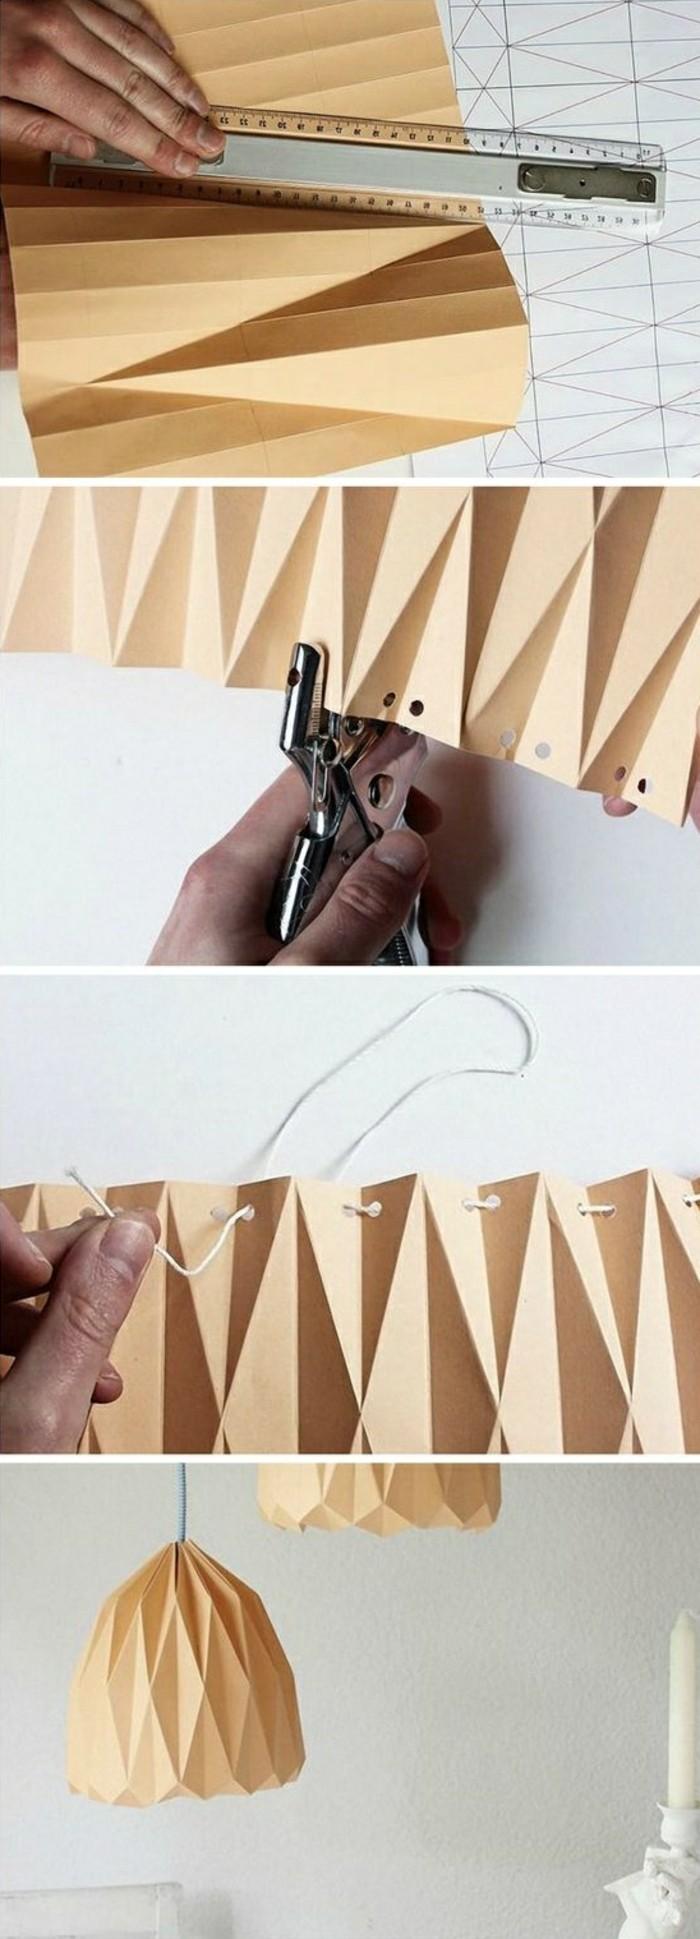 10-lampenschirm-papier-origami-selber-machen-weise-kerze